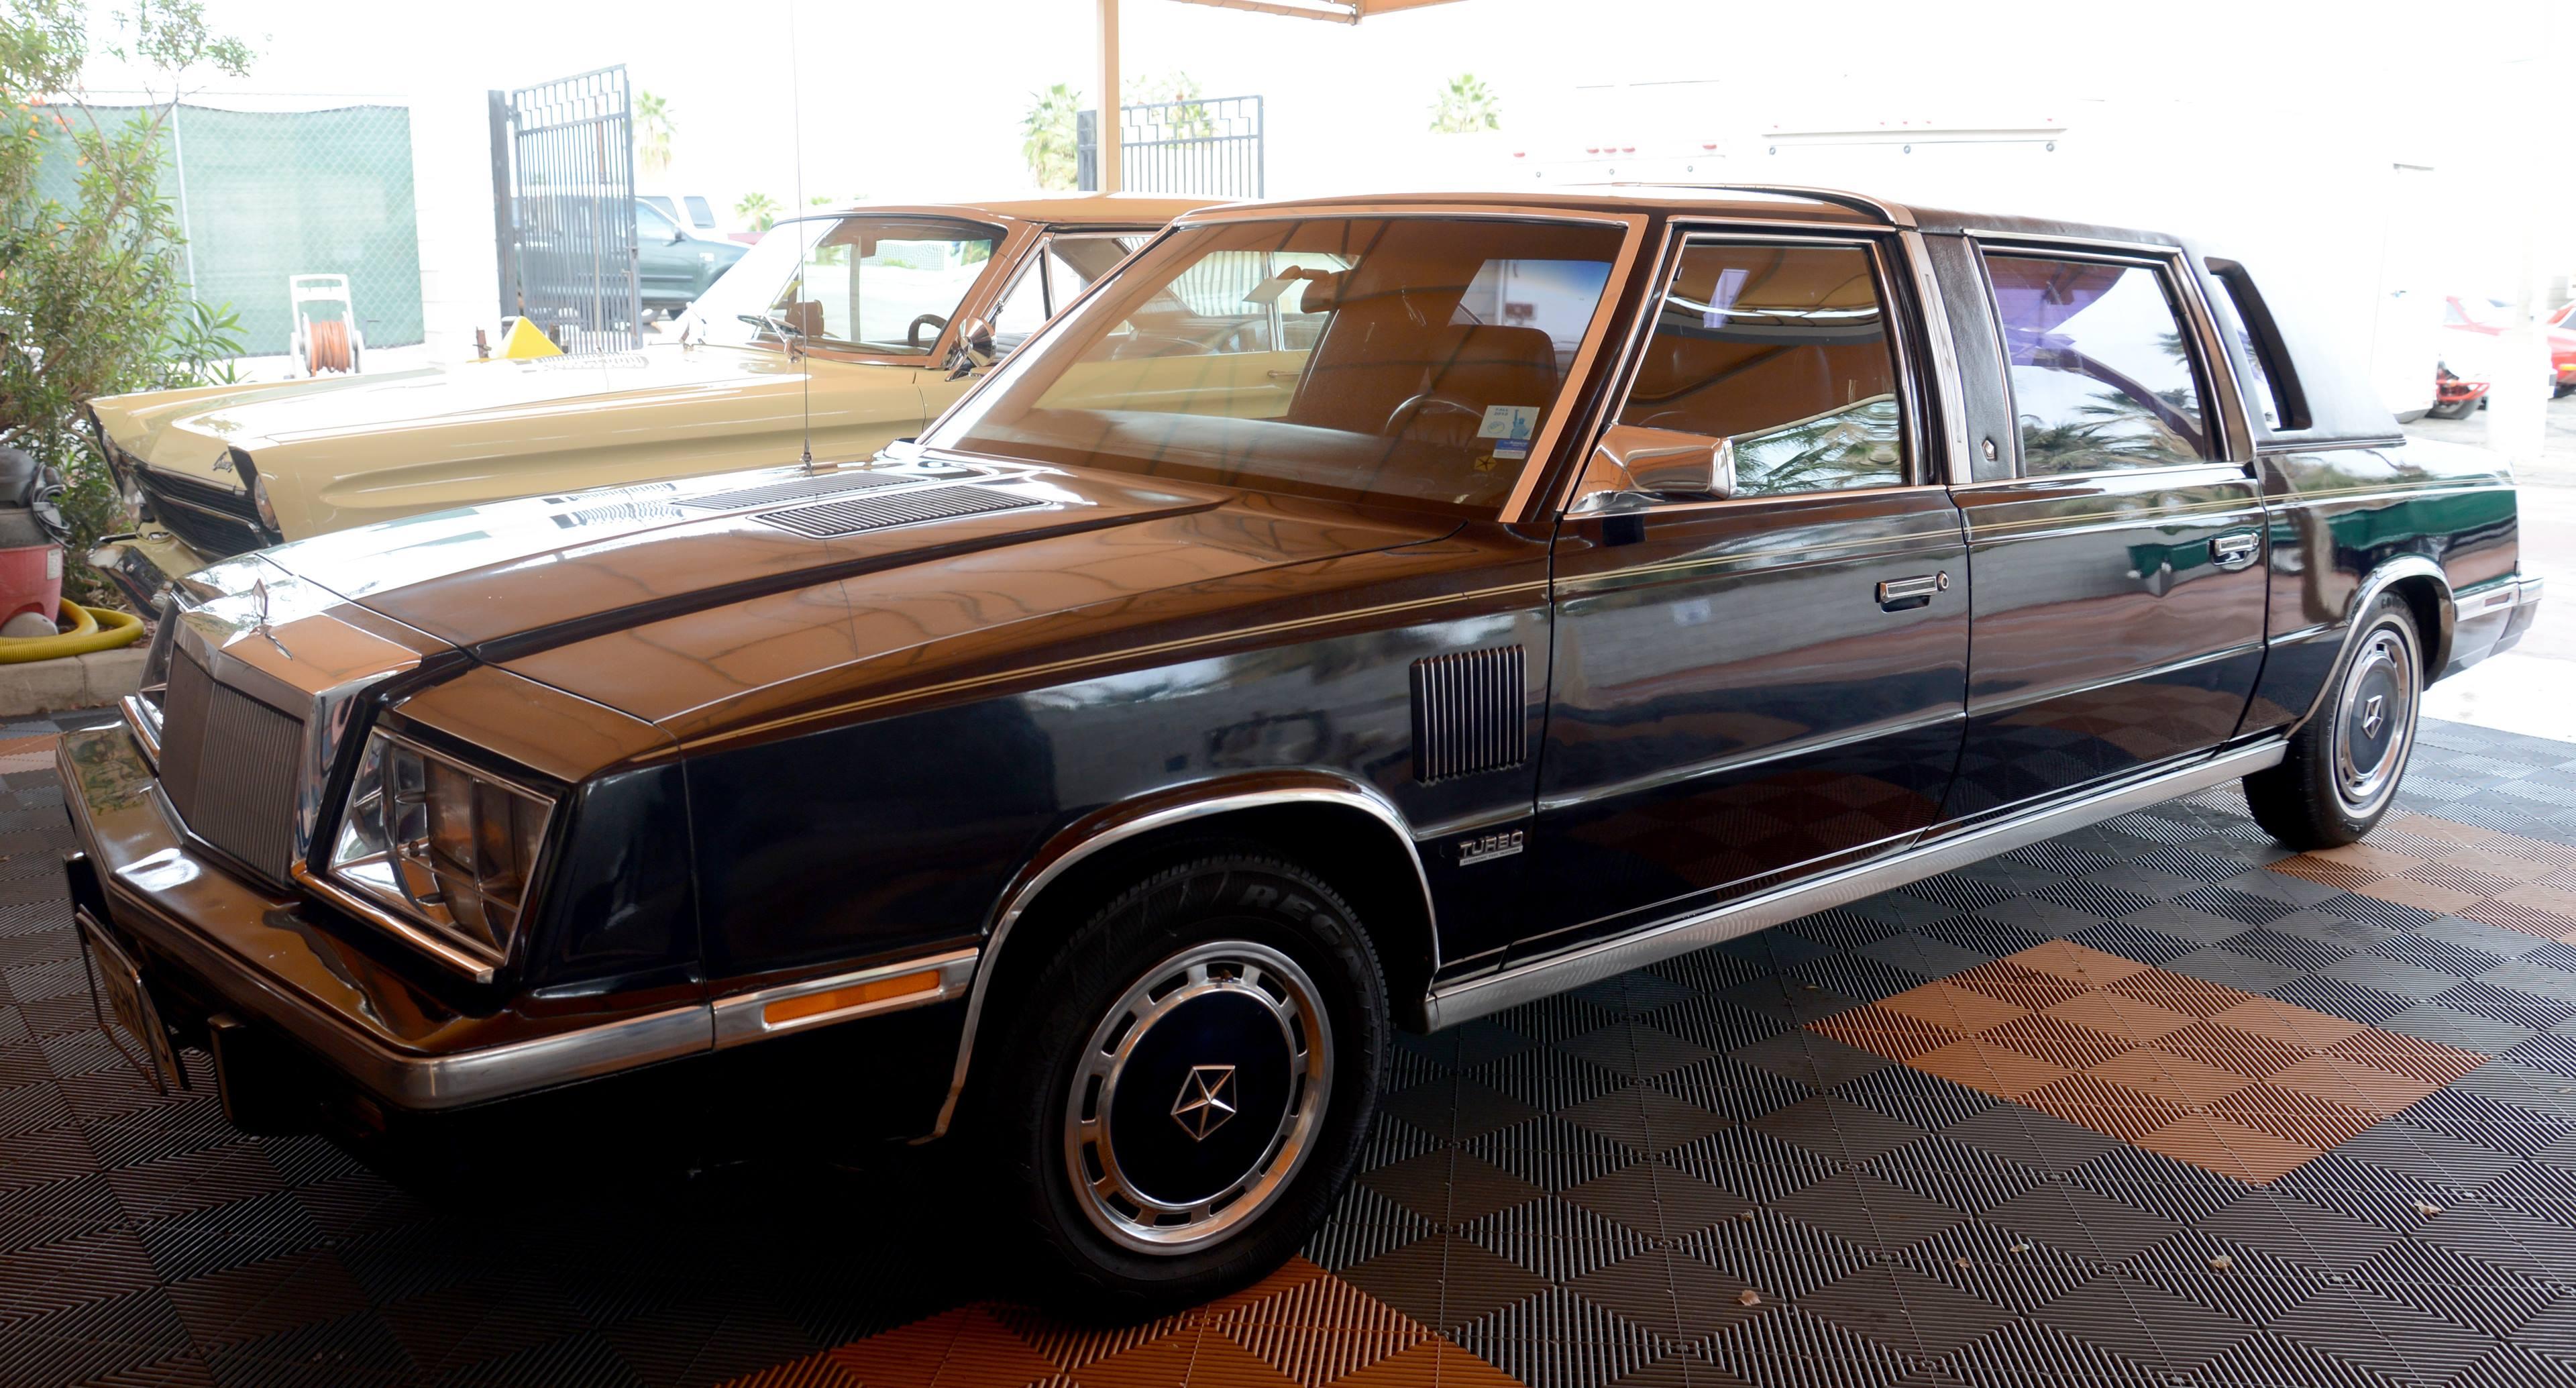 Frank Sinatra's Chrysler K-Car Limousine front left hand corner side